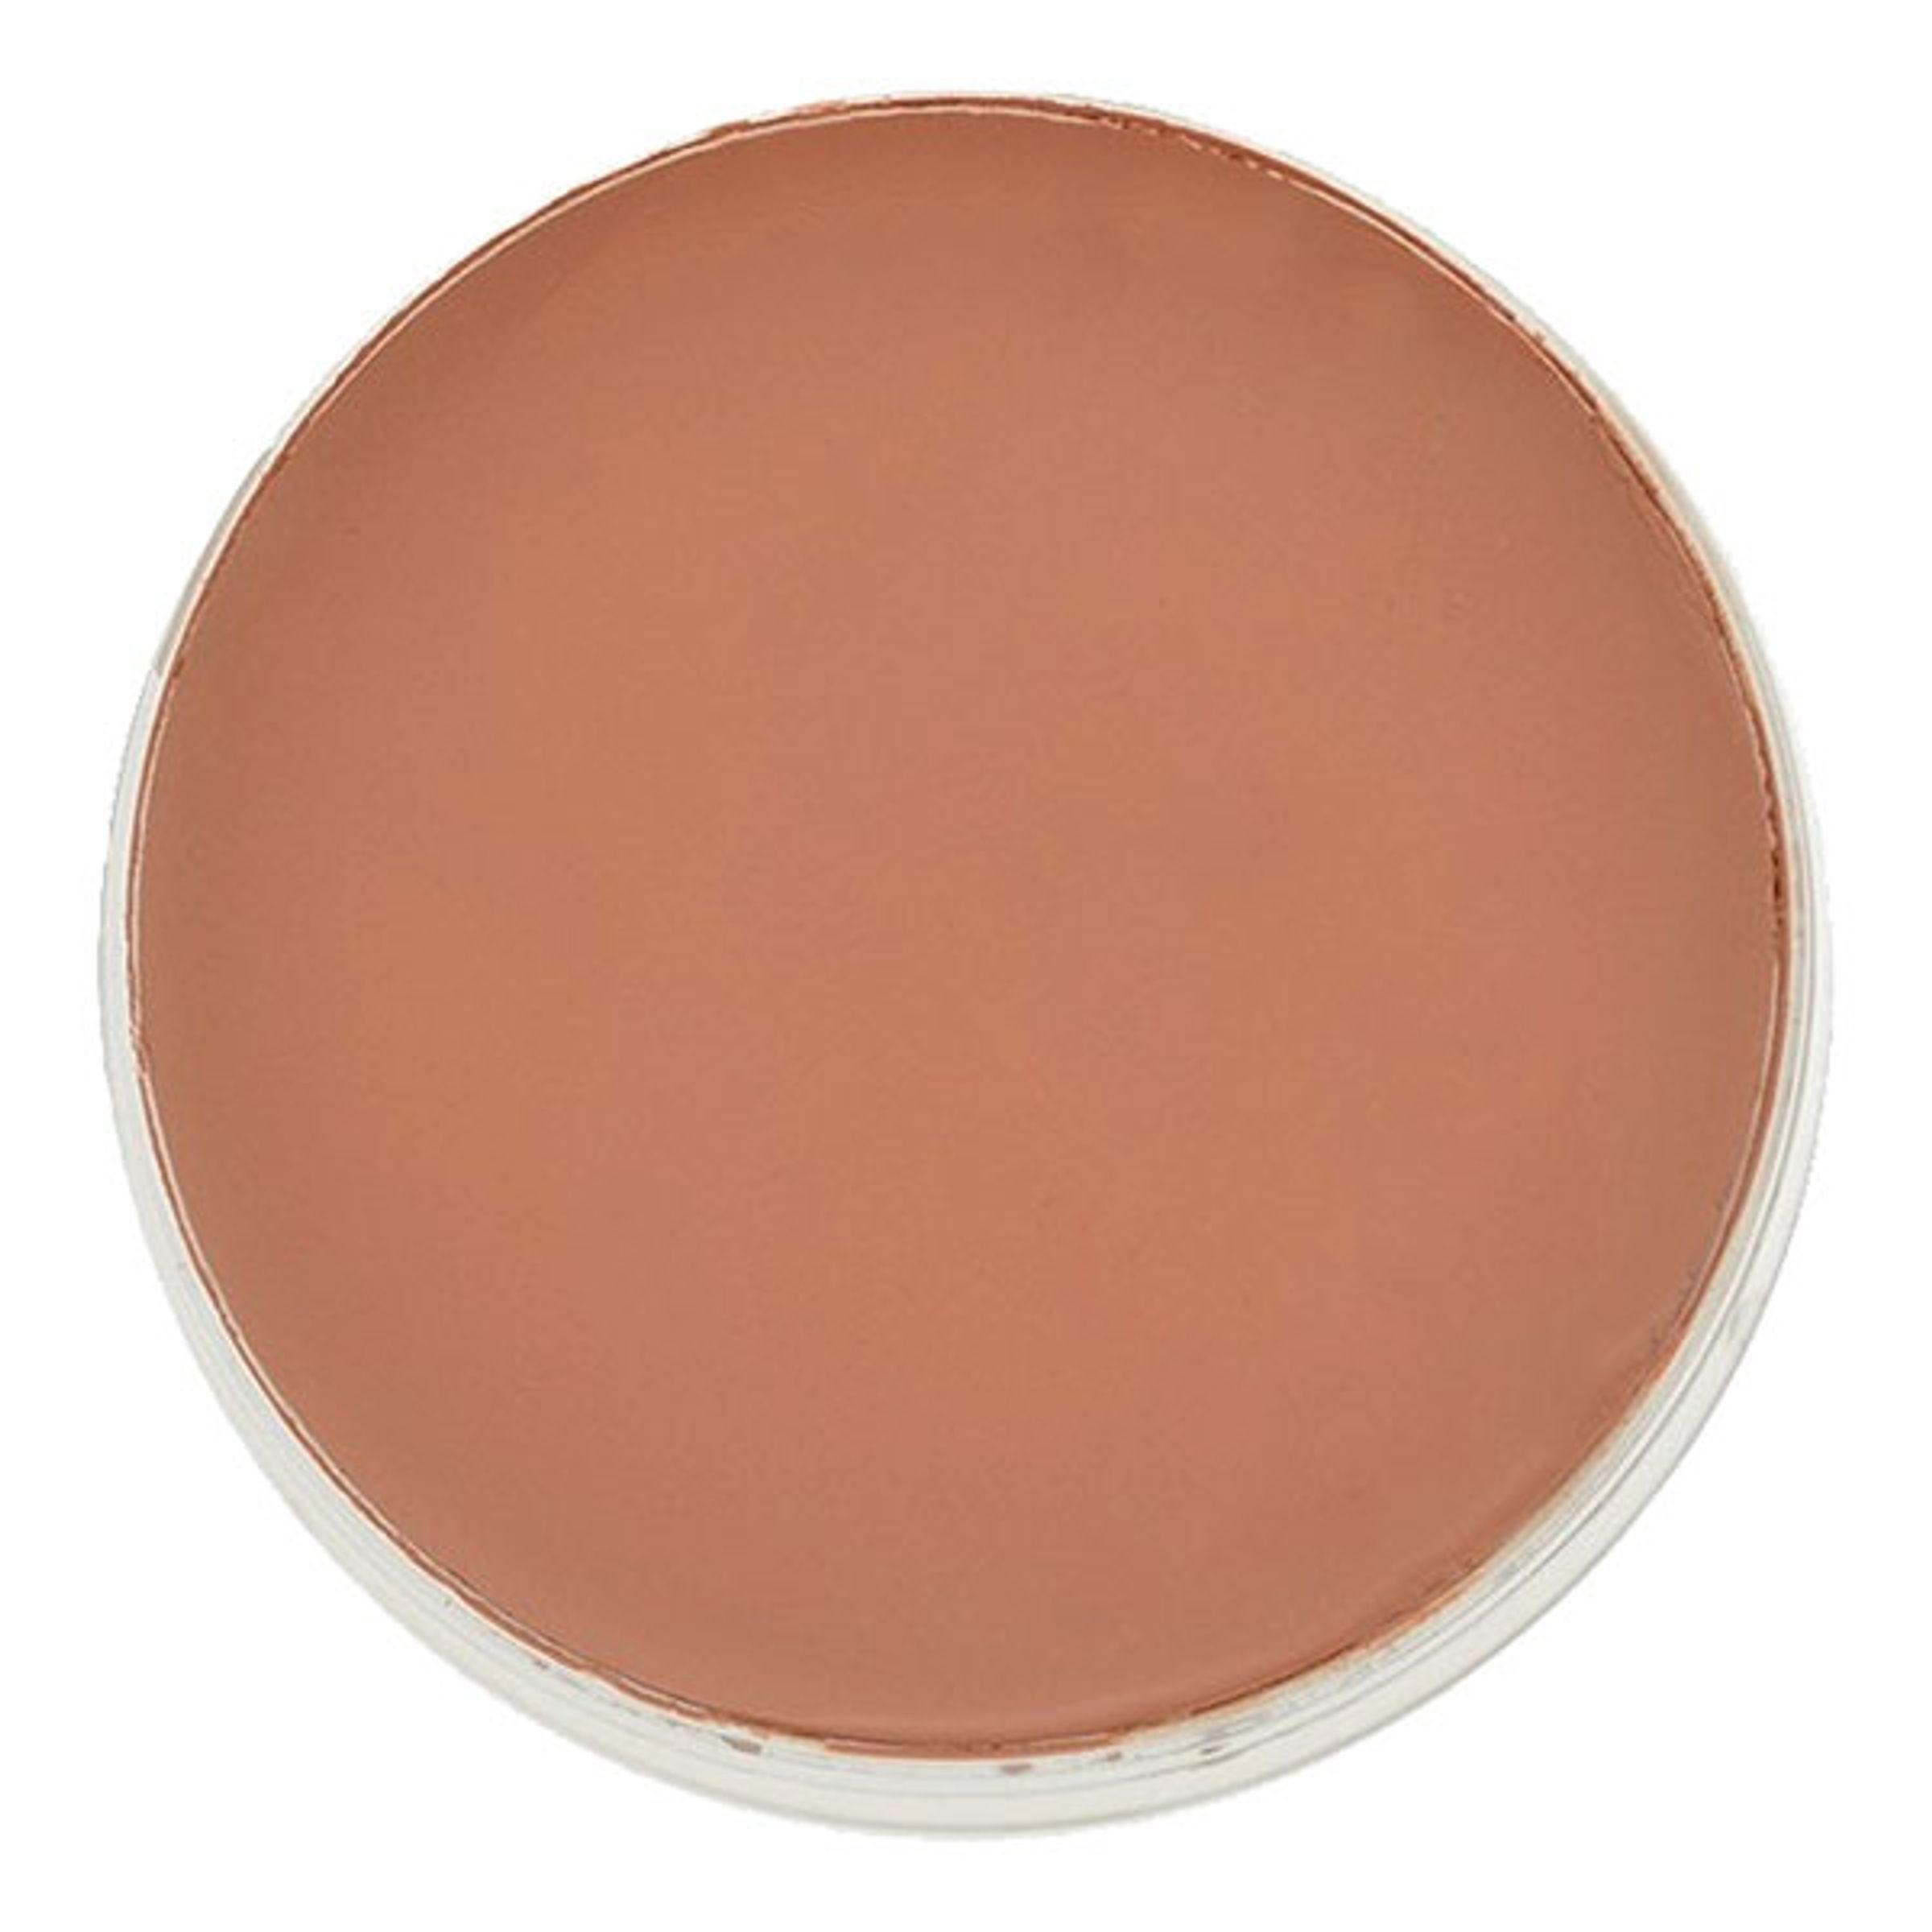 Kryolan Supracolor Smink - 6W